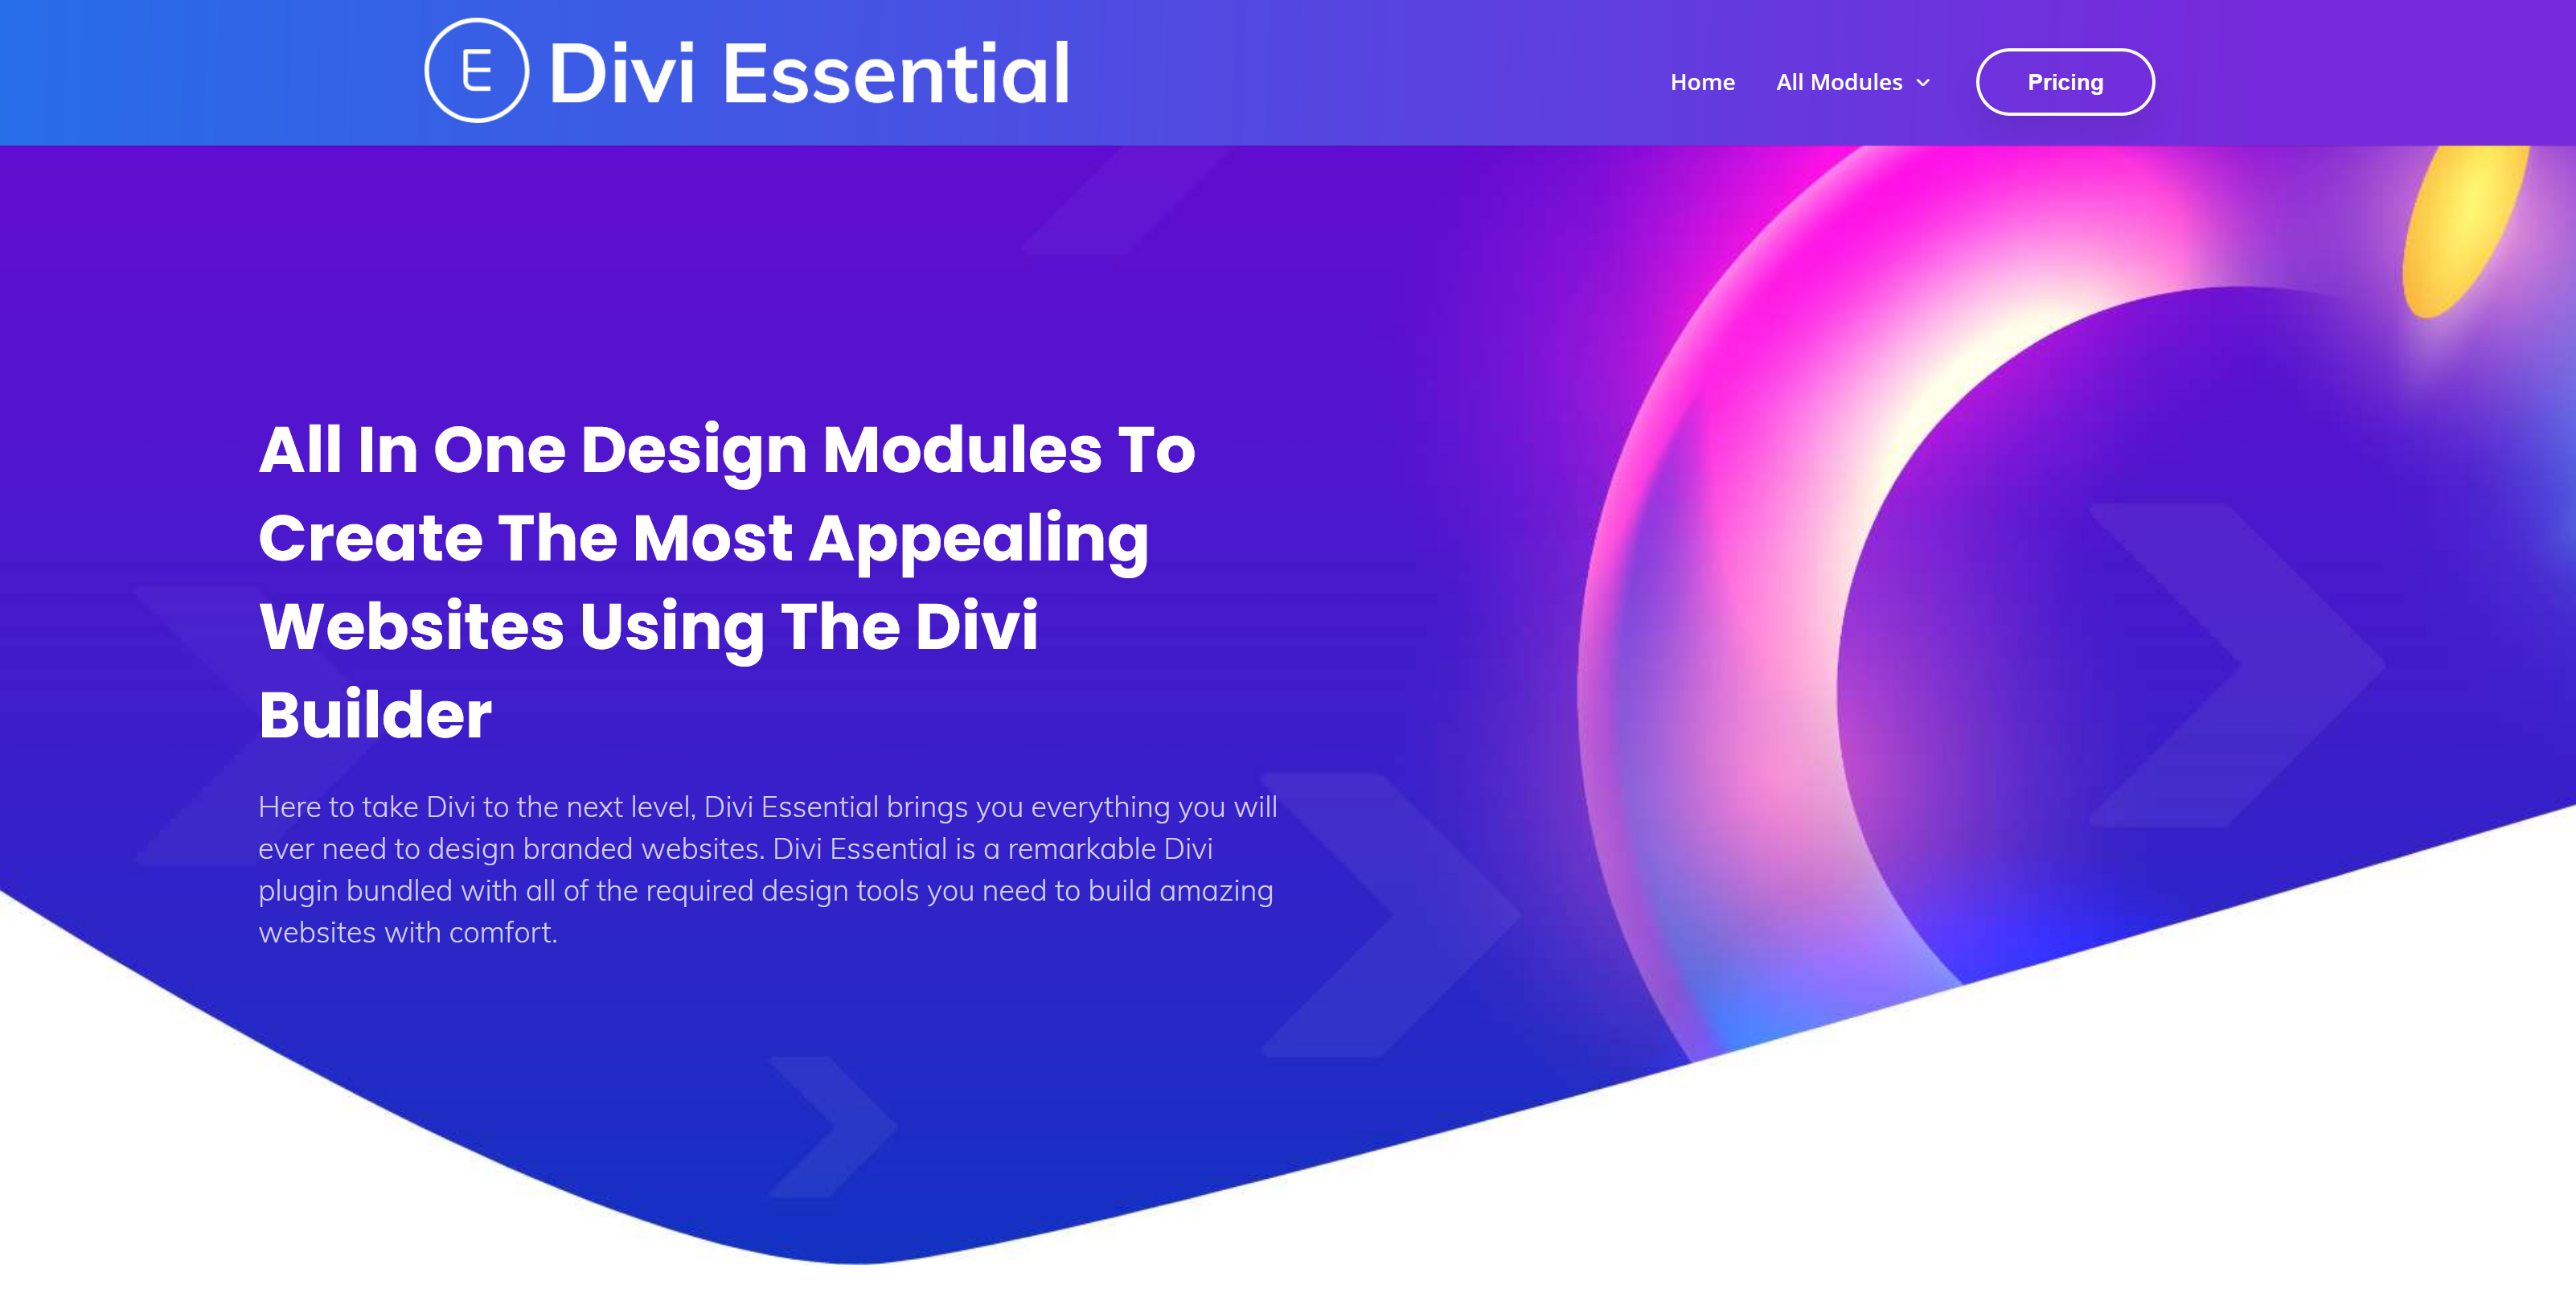 Divi Essential 4.4.0 – Divi Extension For Next Label Modules